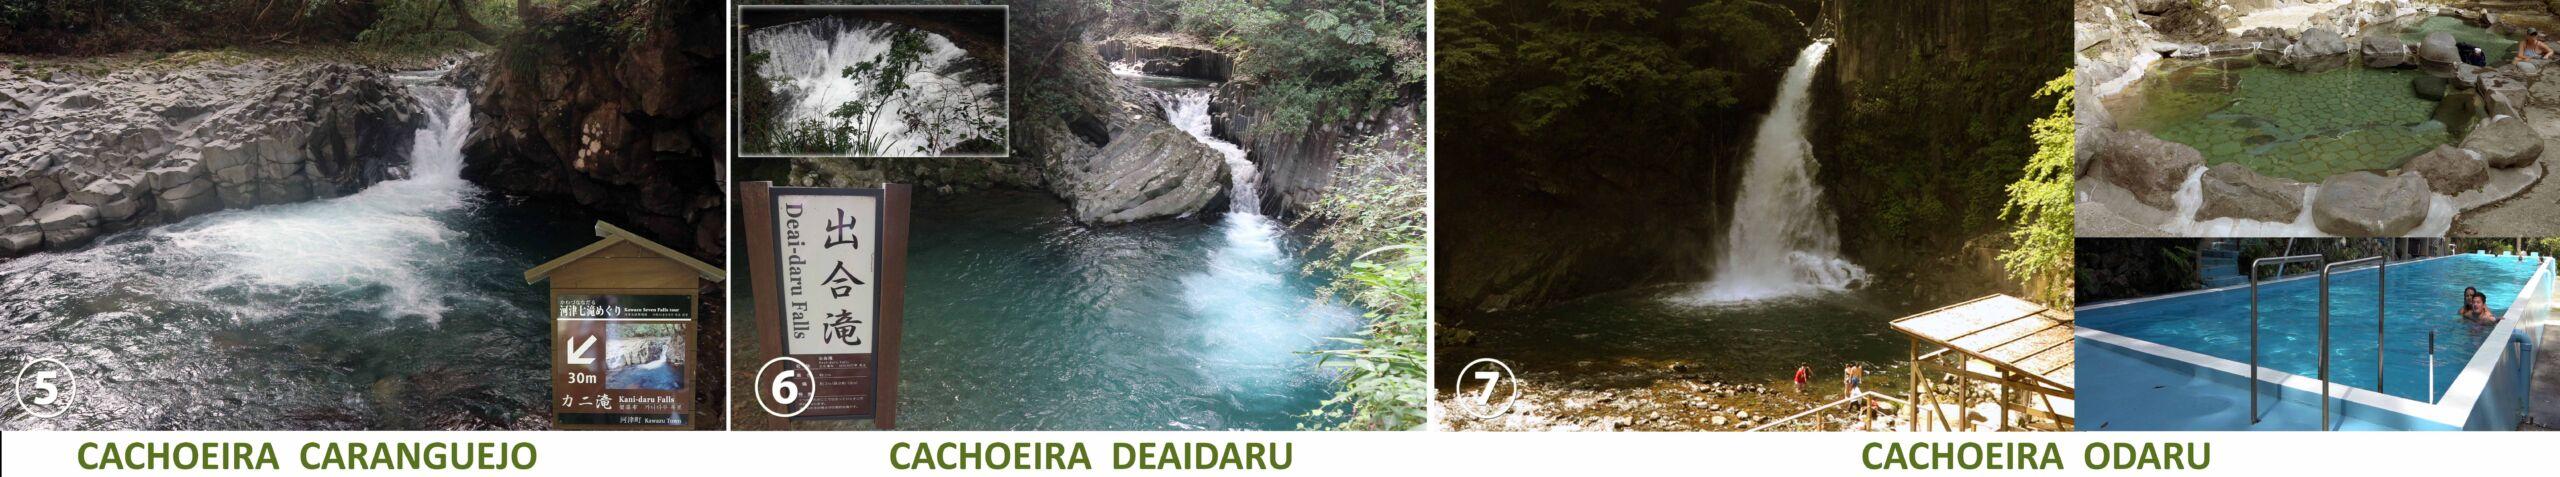 7 Cachoeira de Kawazu Nanadaru - 河津 七 滝 2